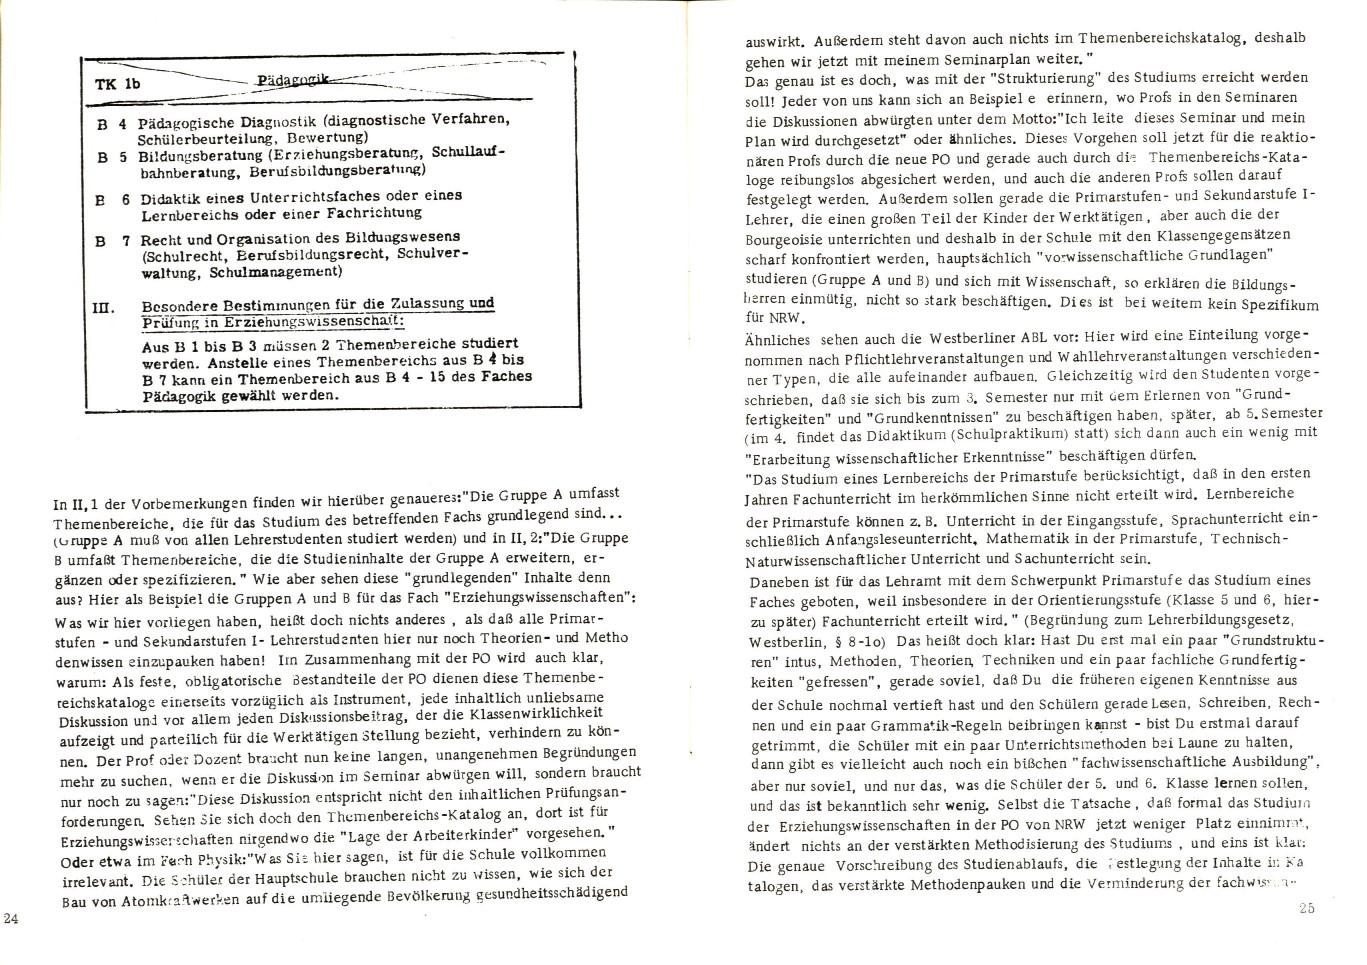 KSV_1975_Lehrerausbildung_13